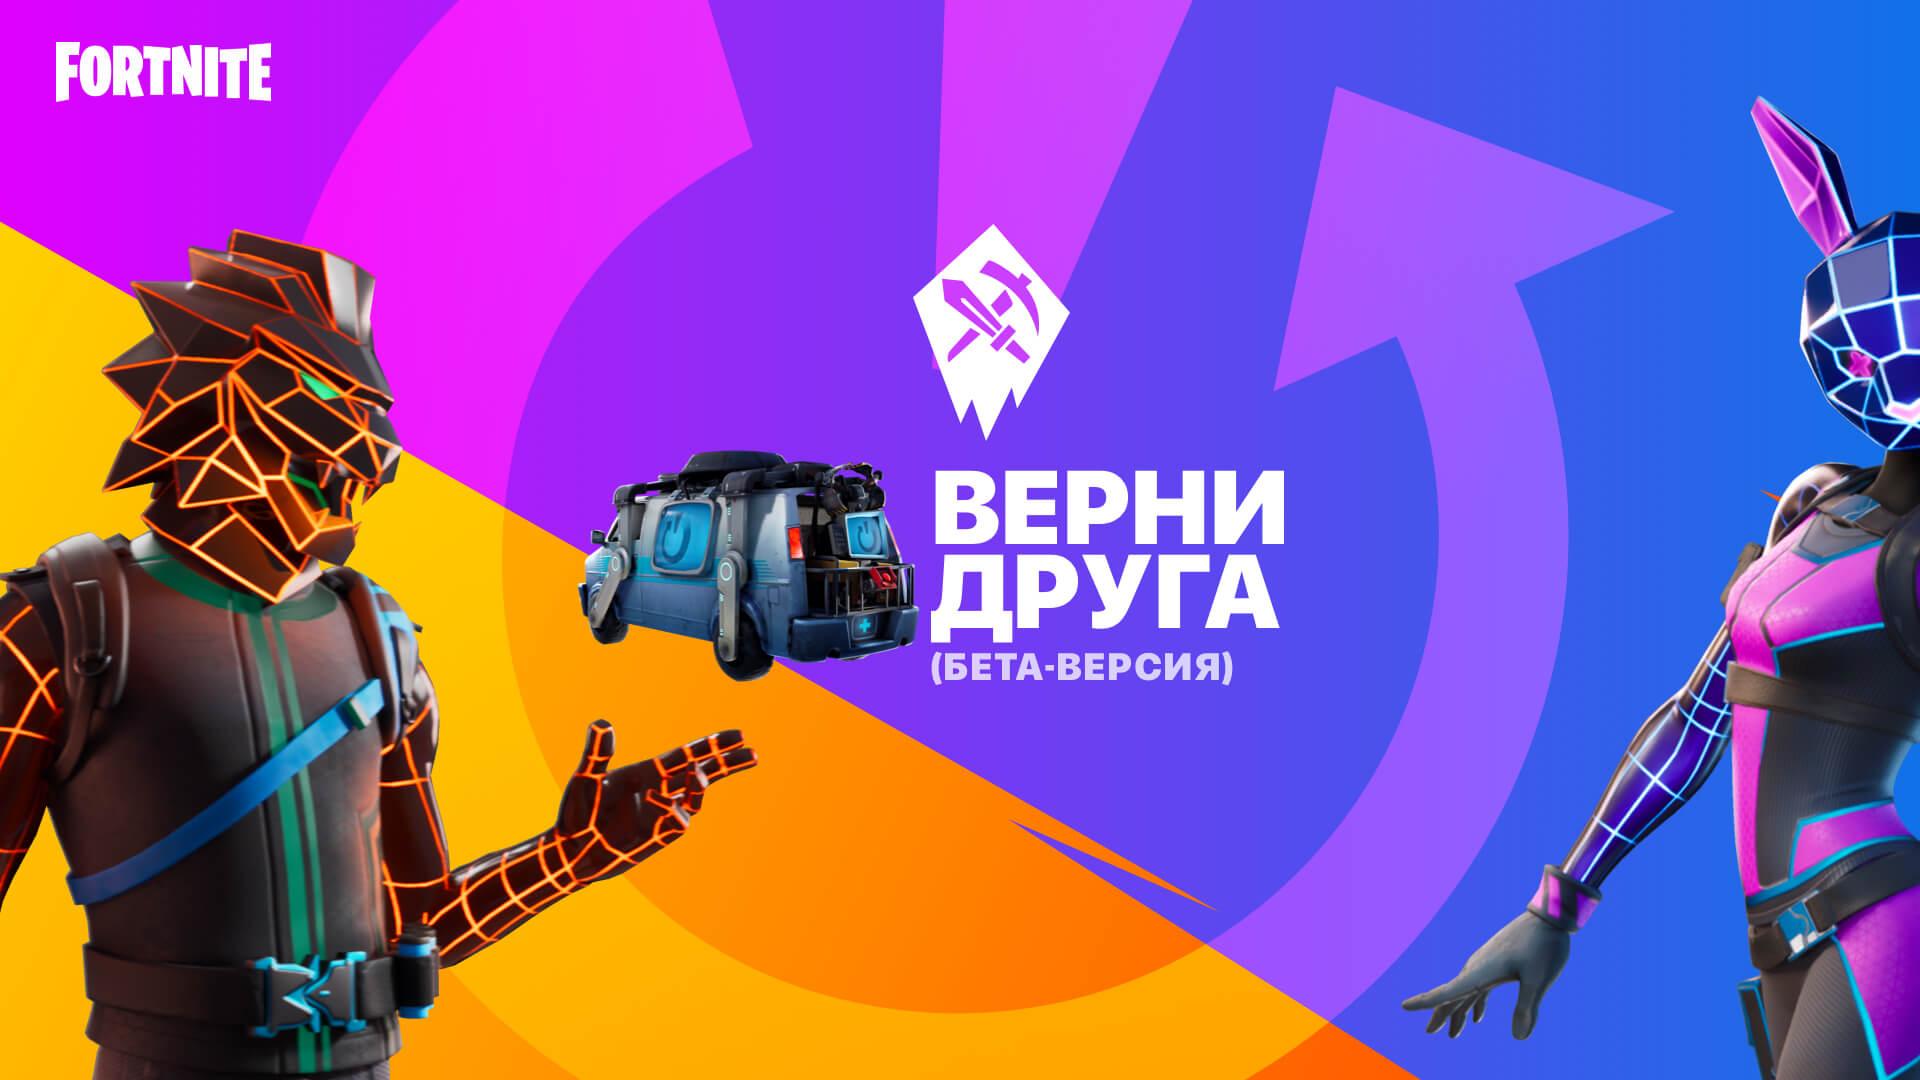 1920 1080 Russian